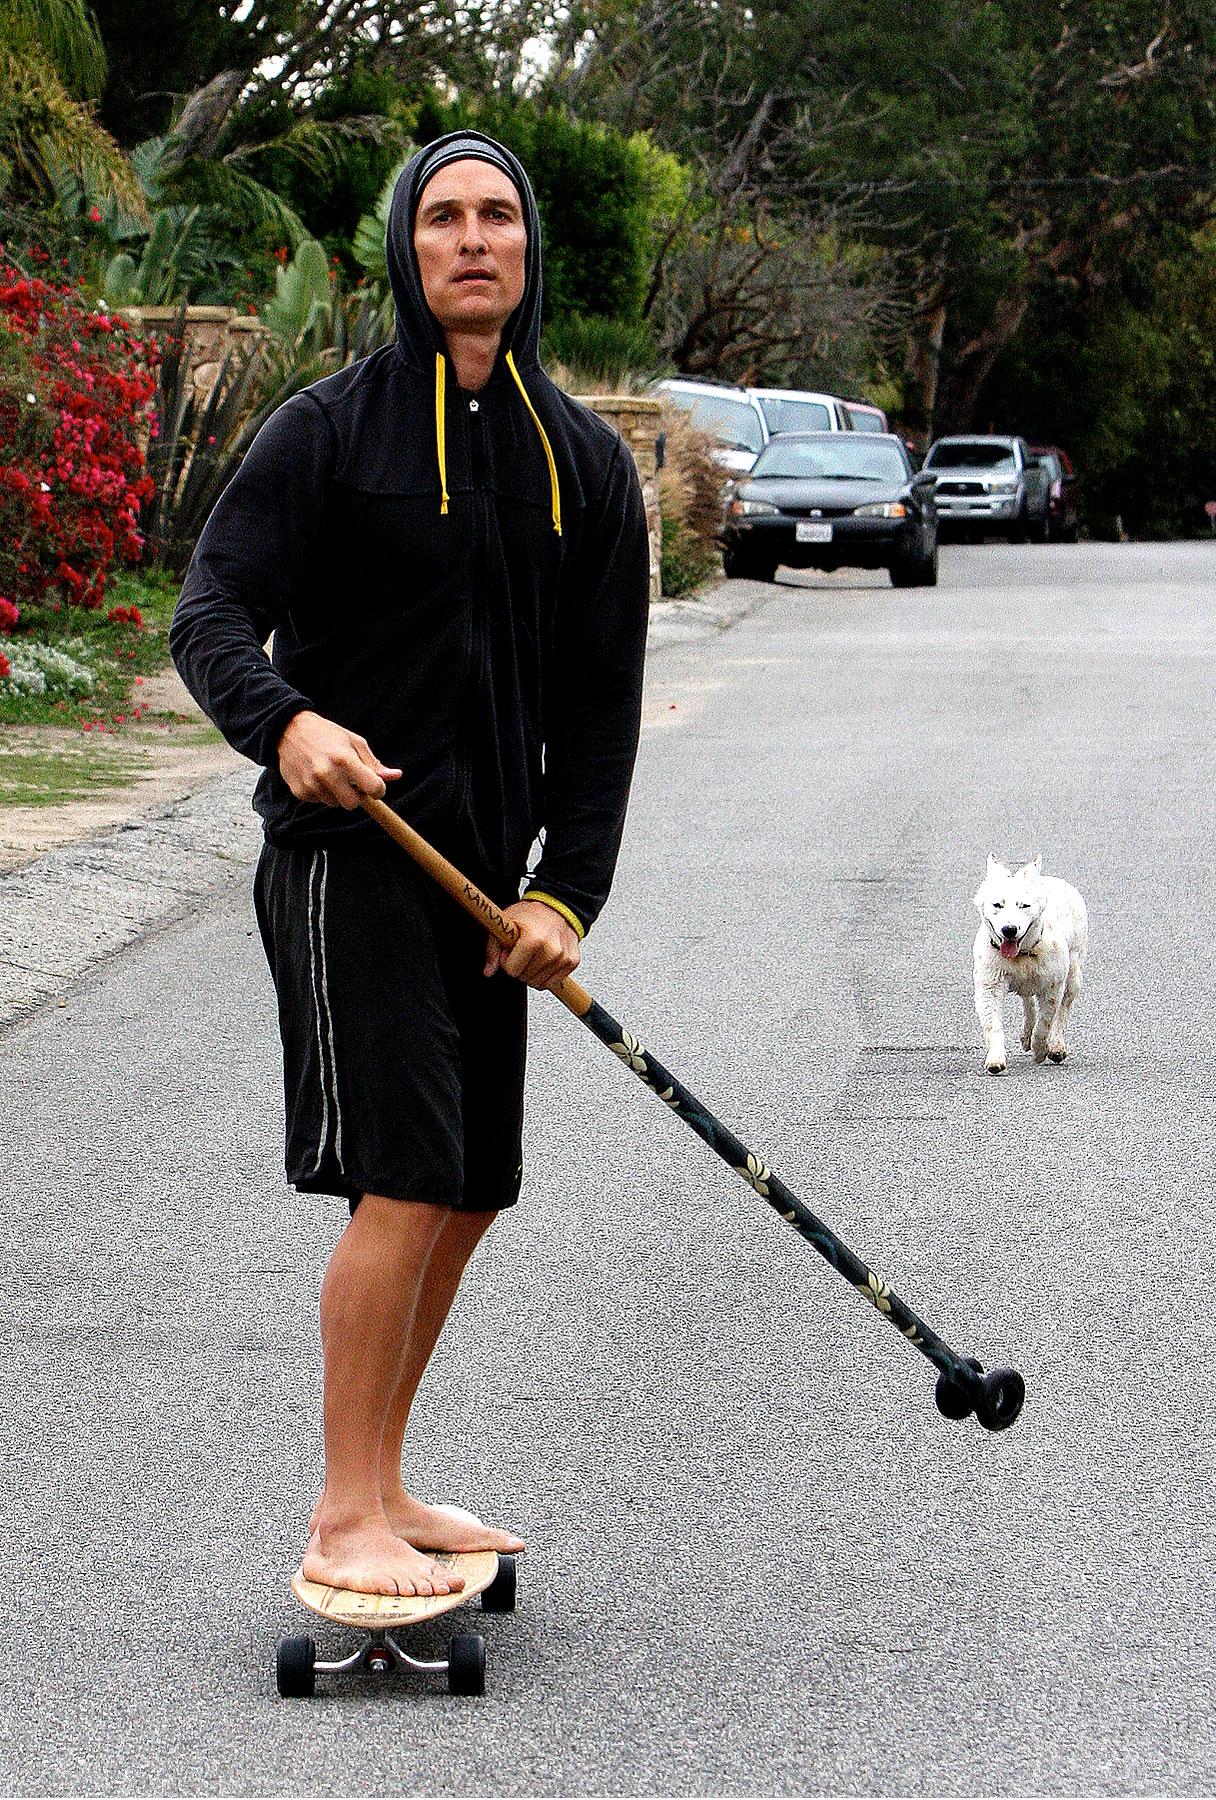 Matthew McConaughey: Skateboard or Gondola?